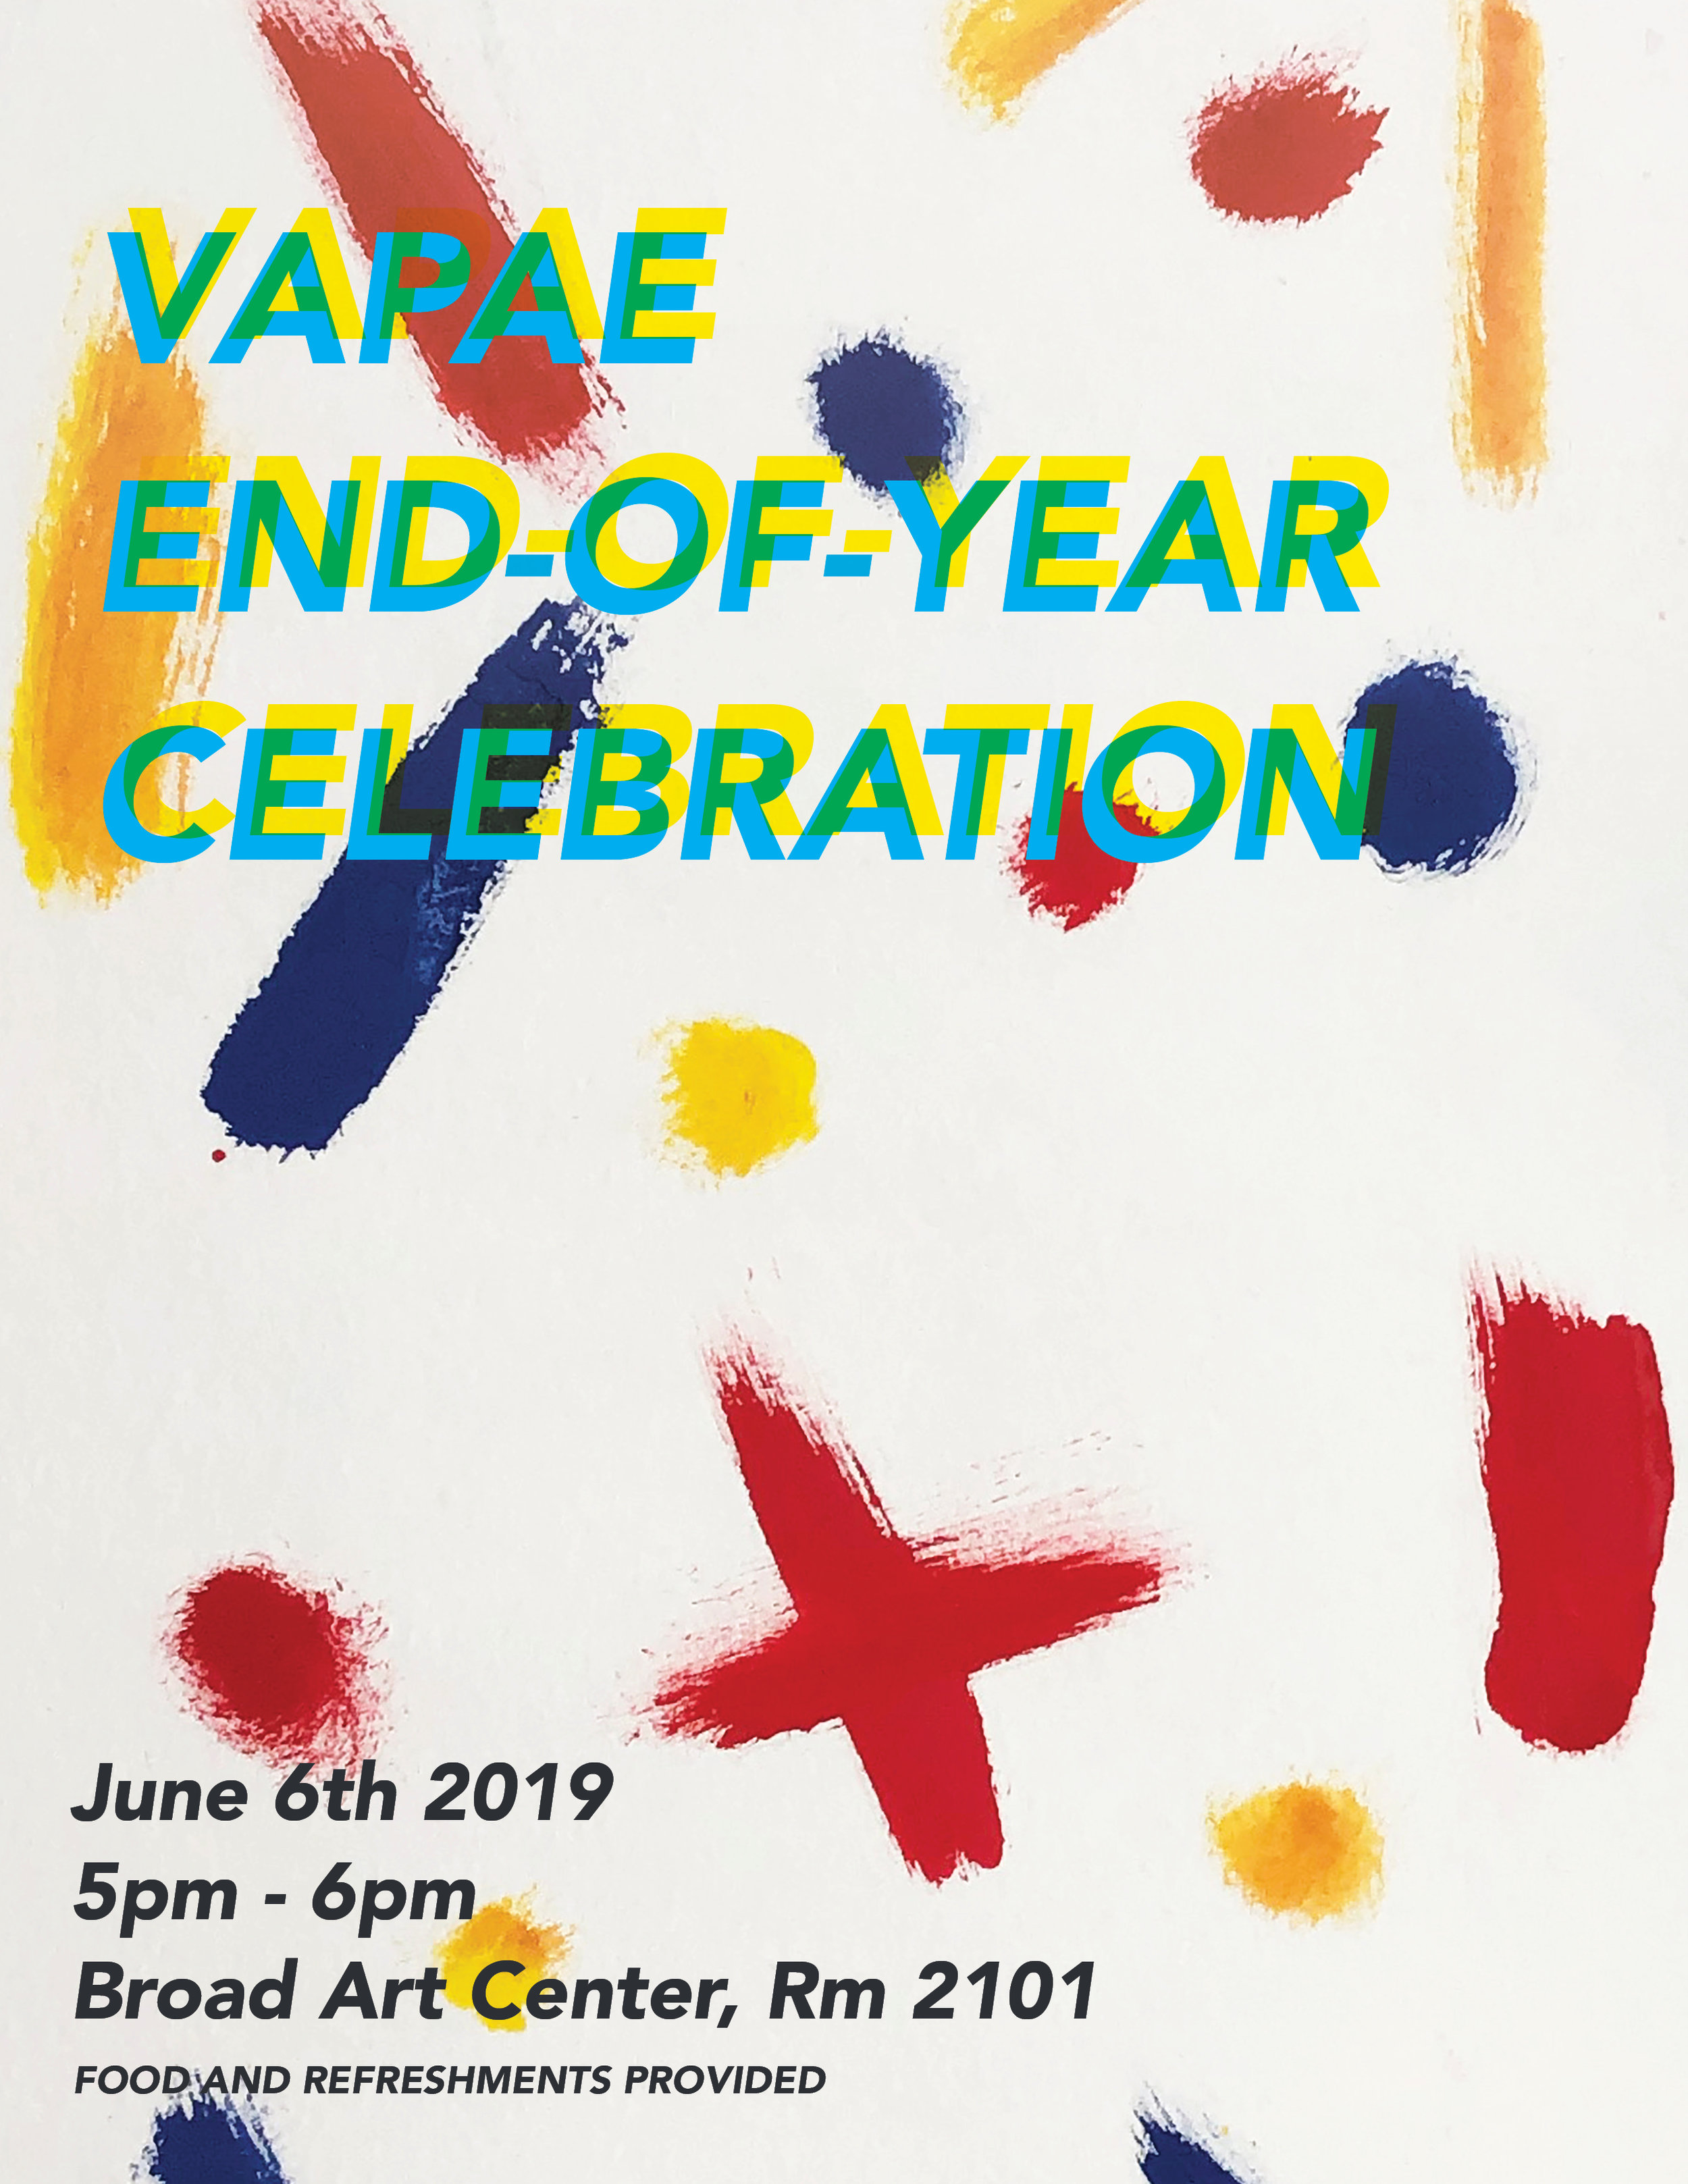 EndOfYear Celebration_V4.jpg